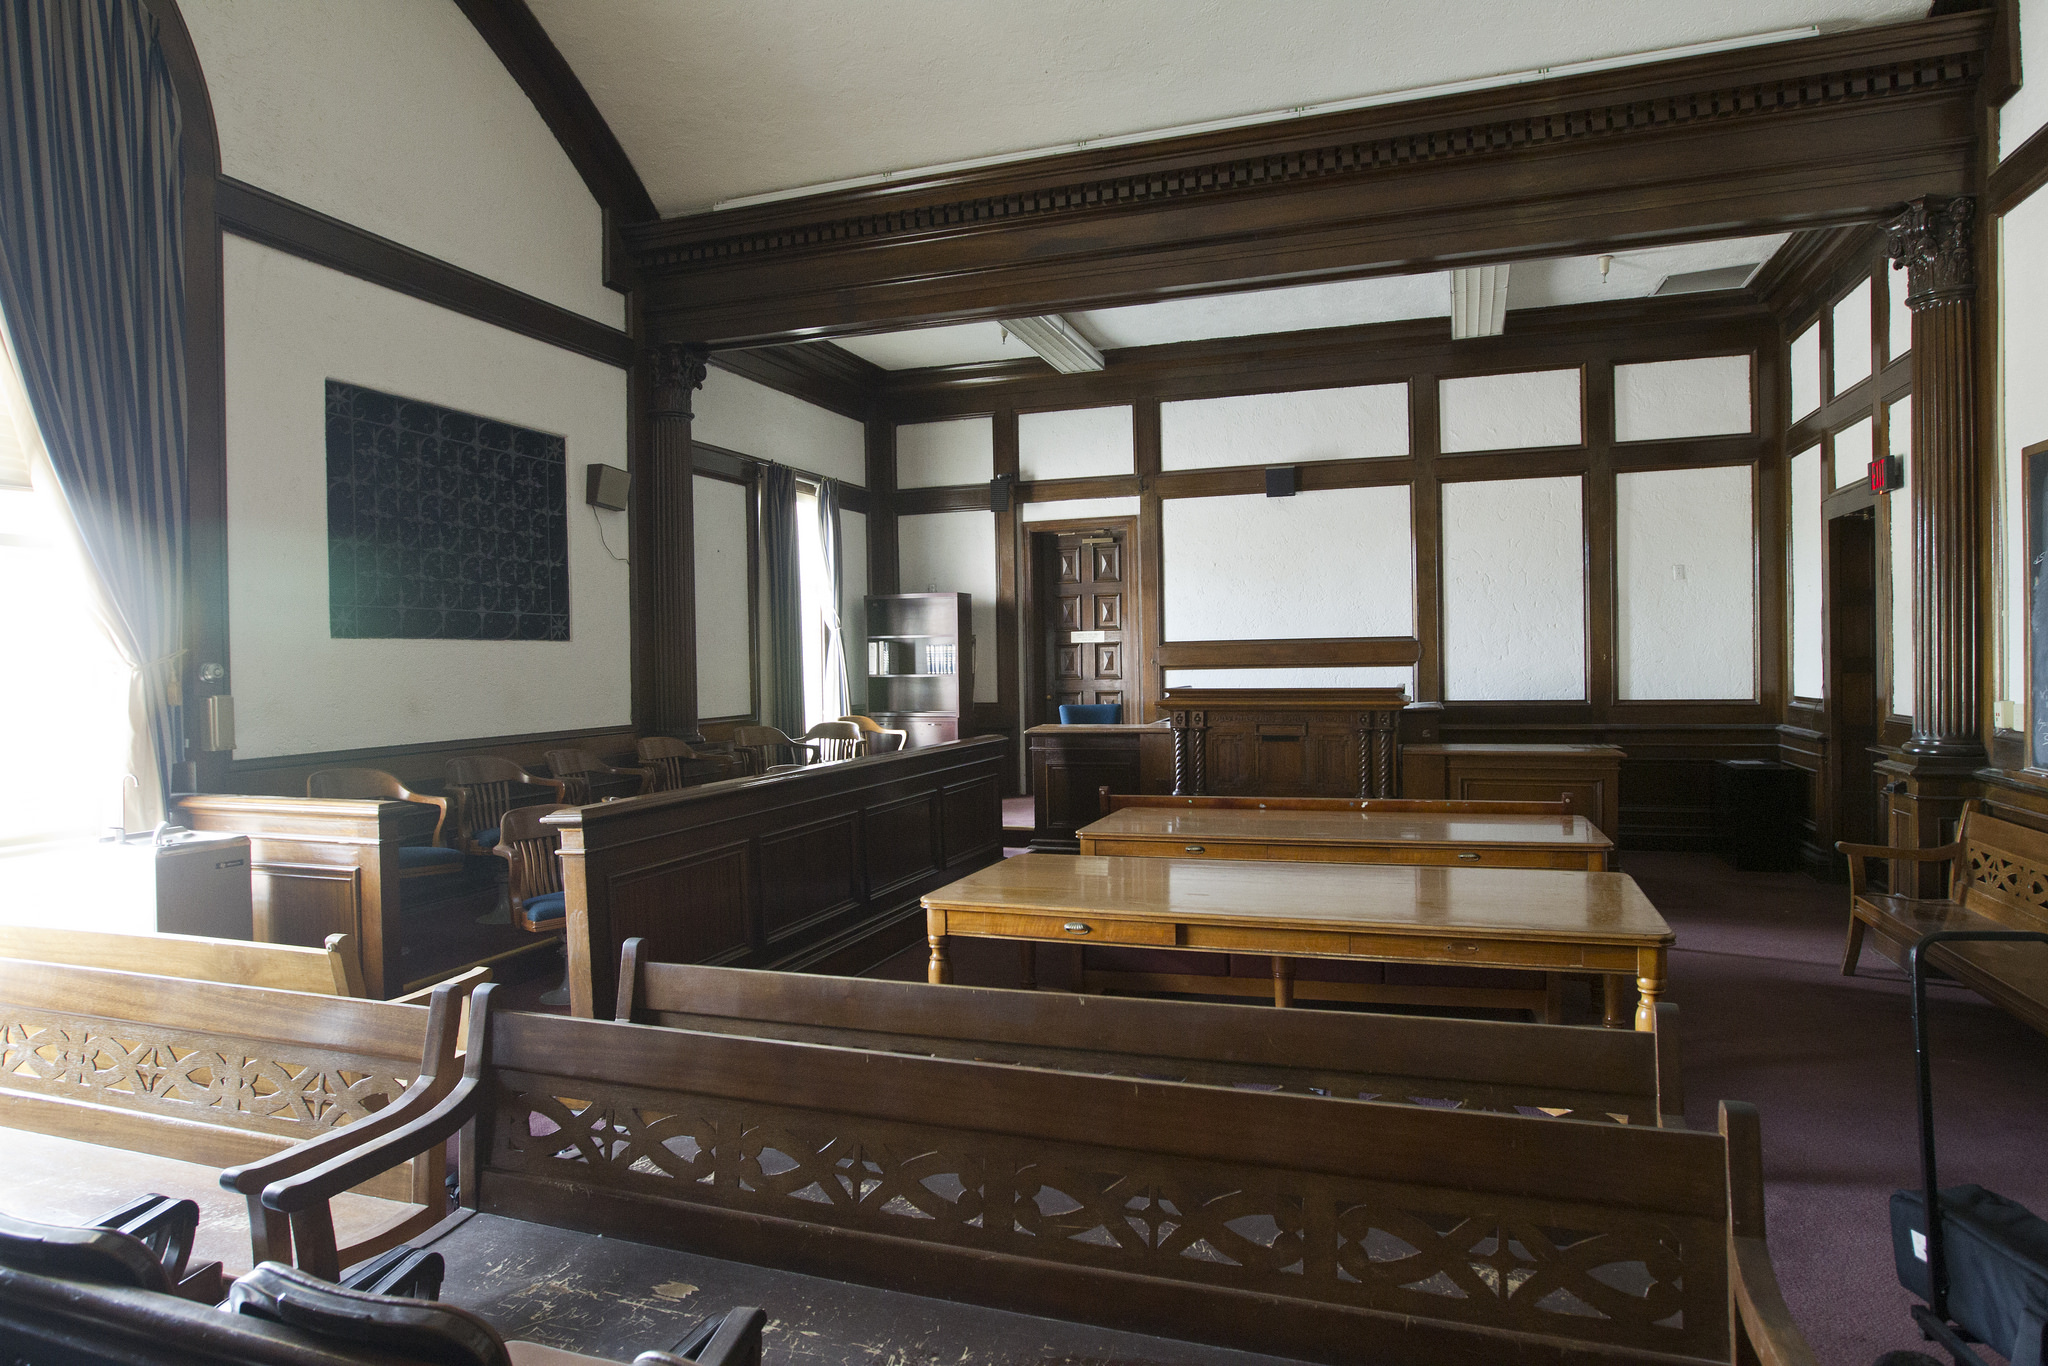 photos  inside the historic pima county courthouse